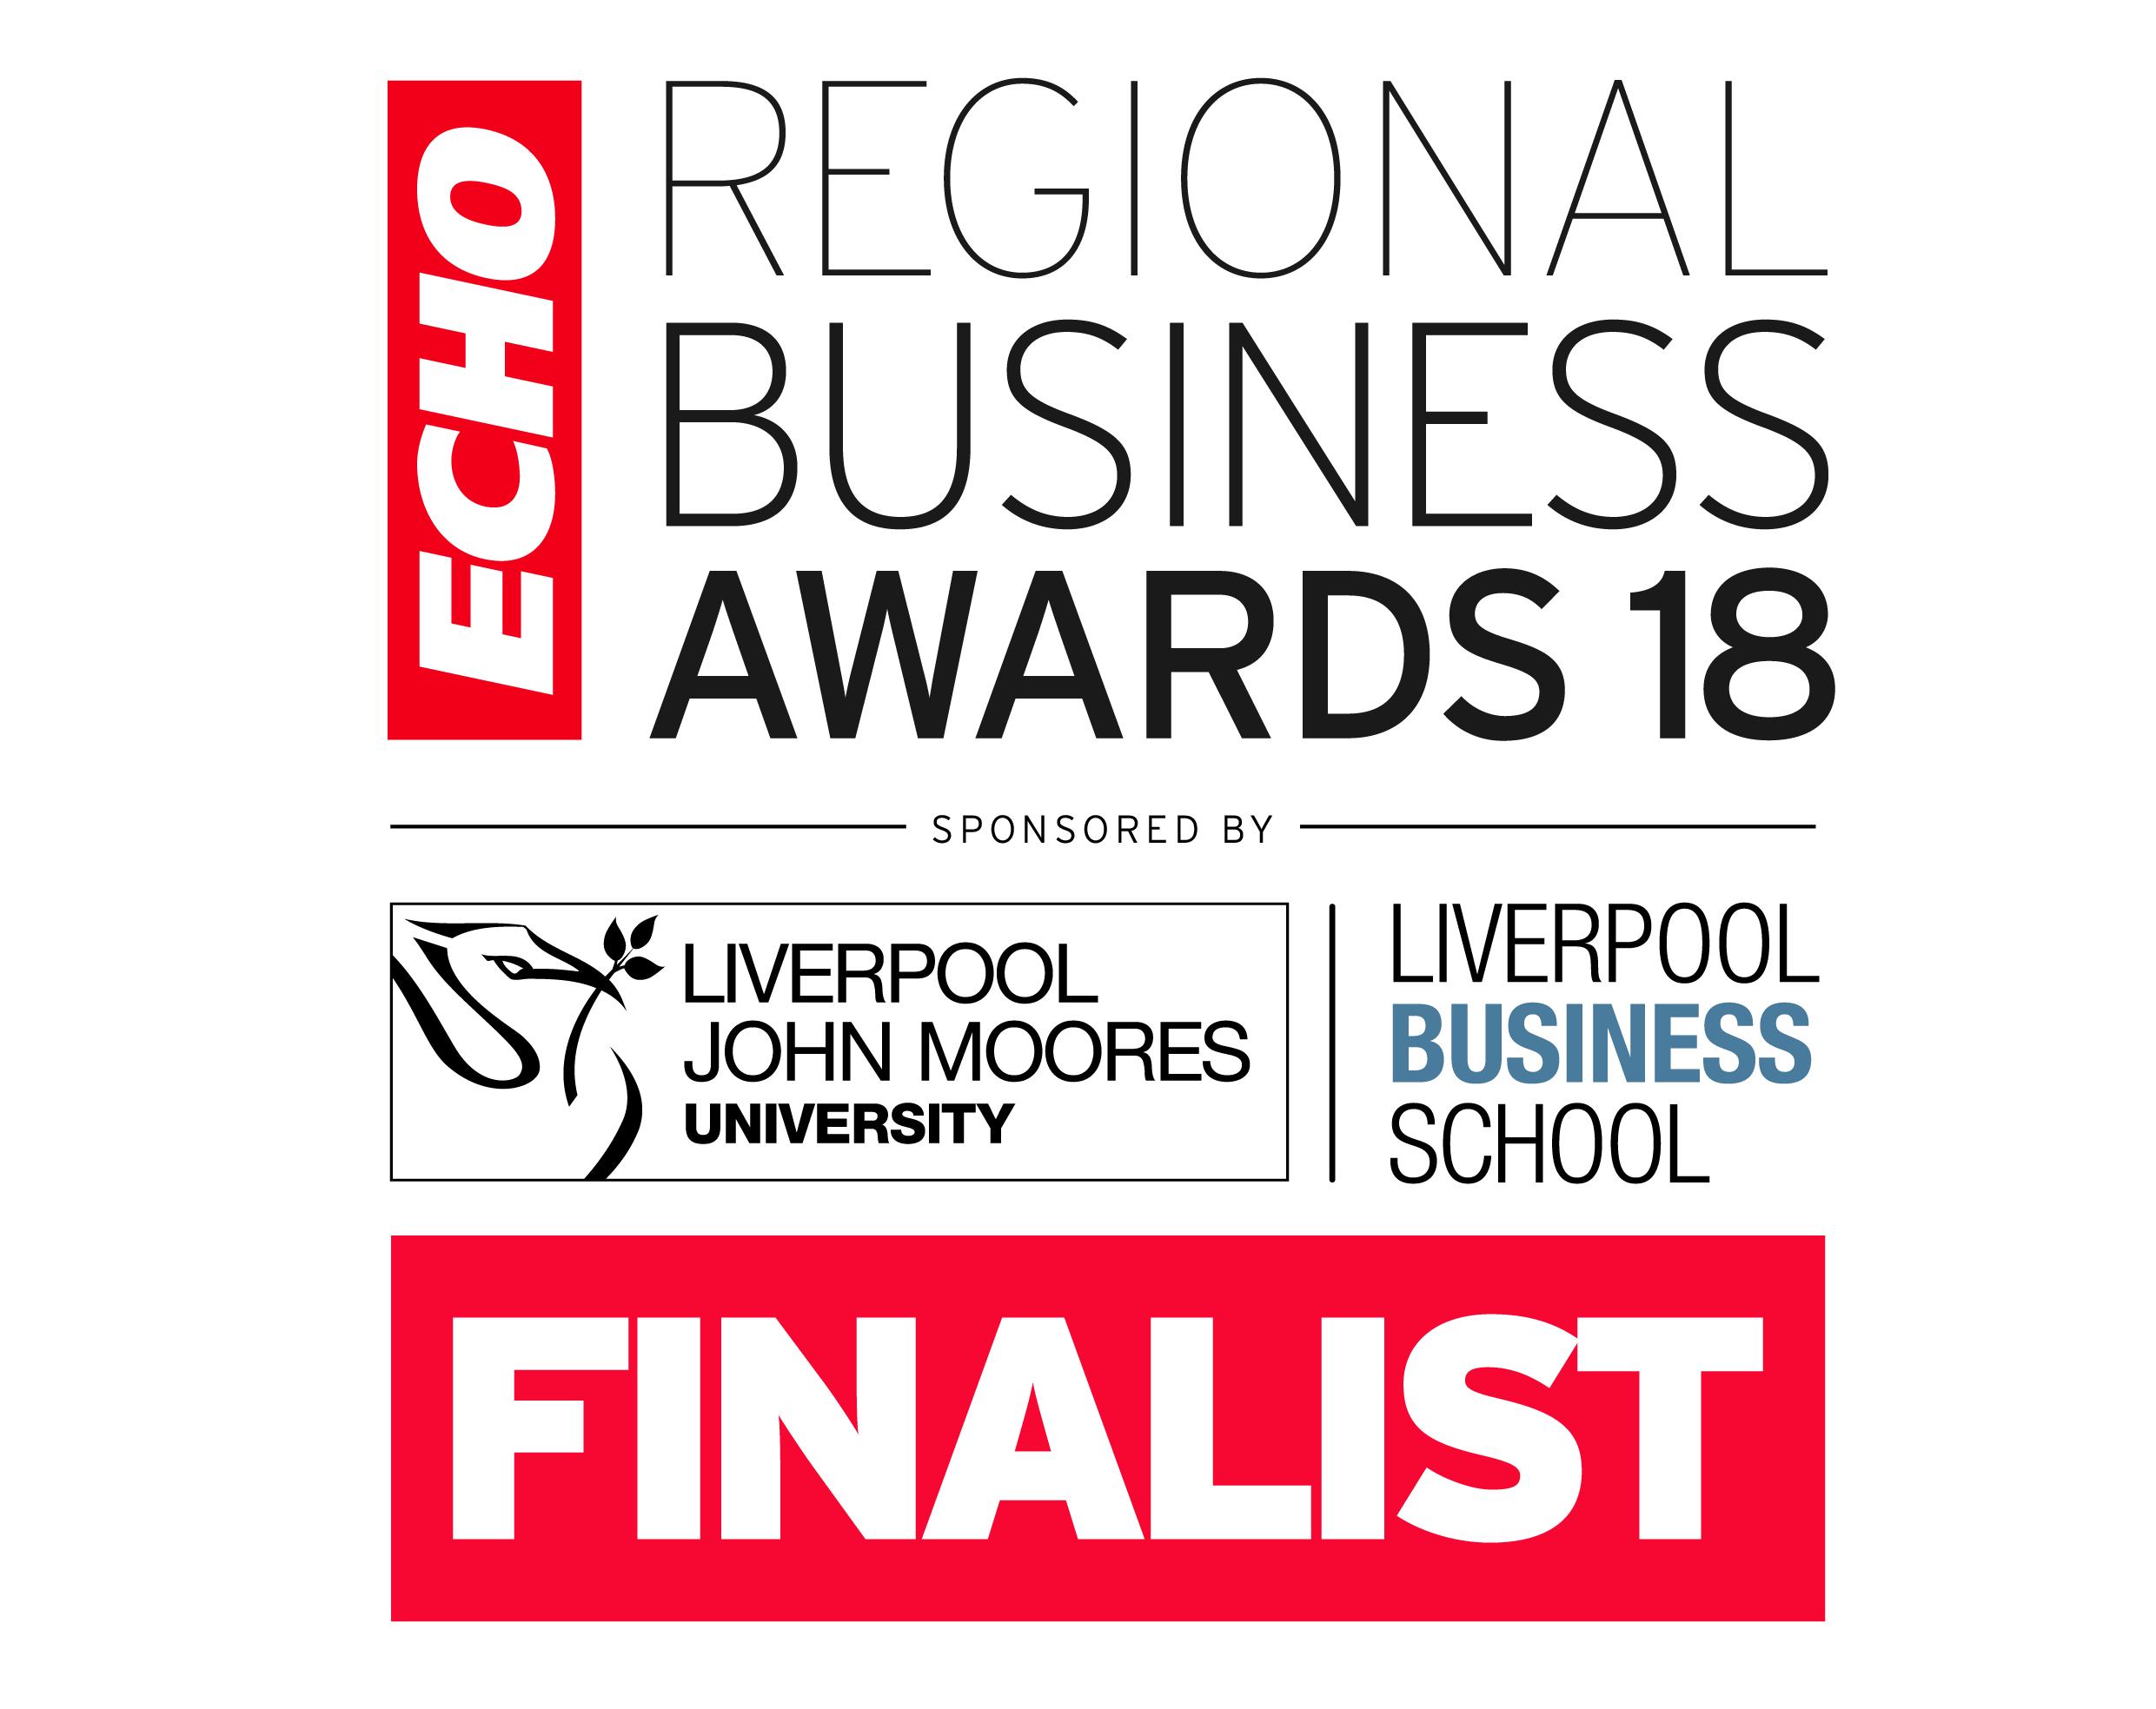 Echo Regional Business Awards 18 Finalist